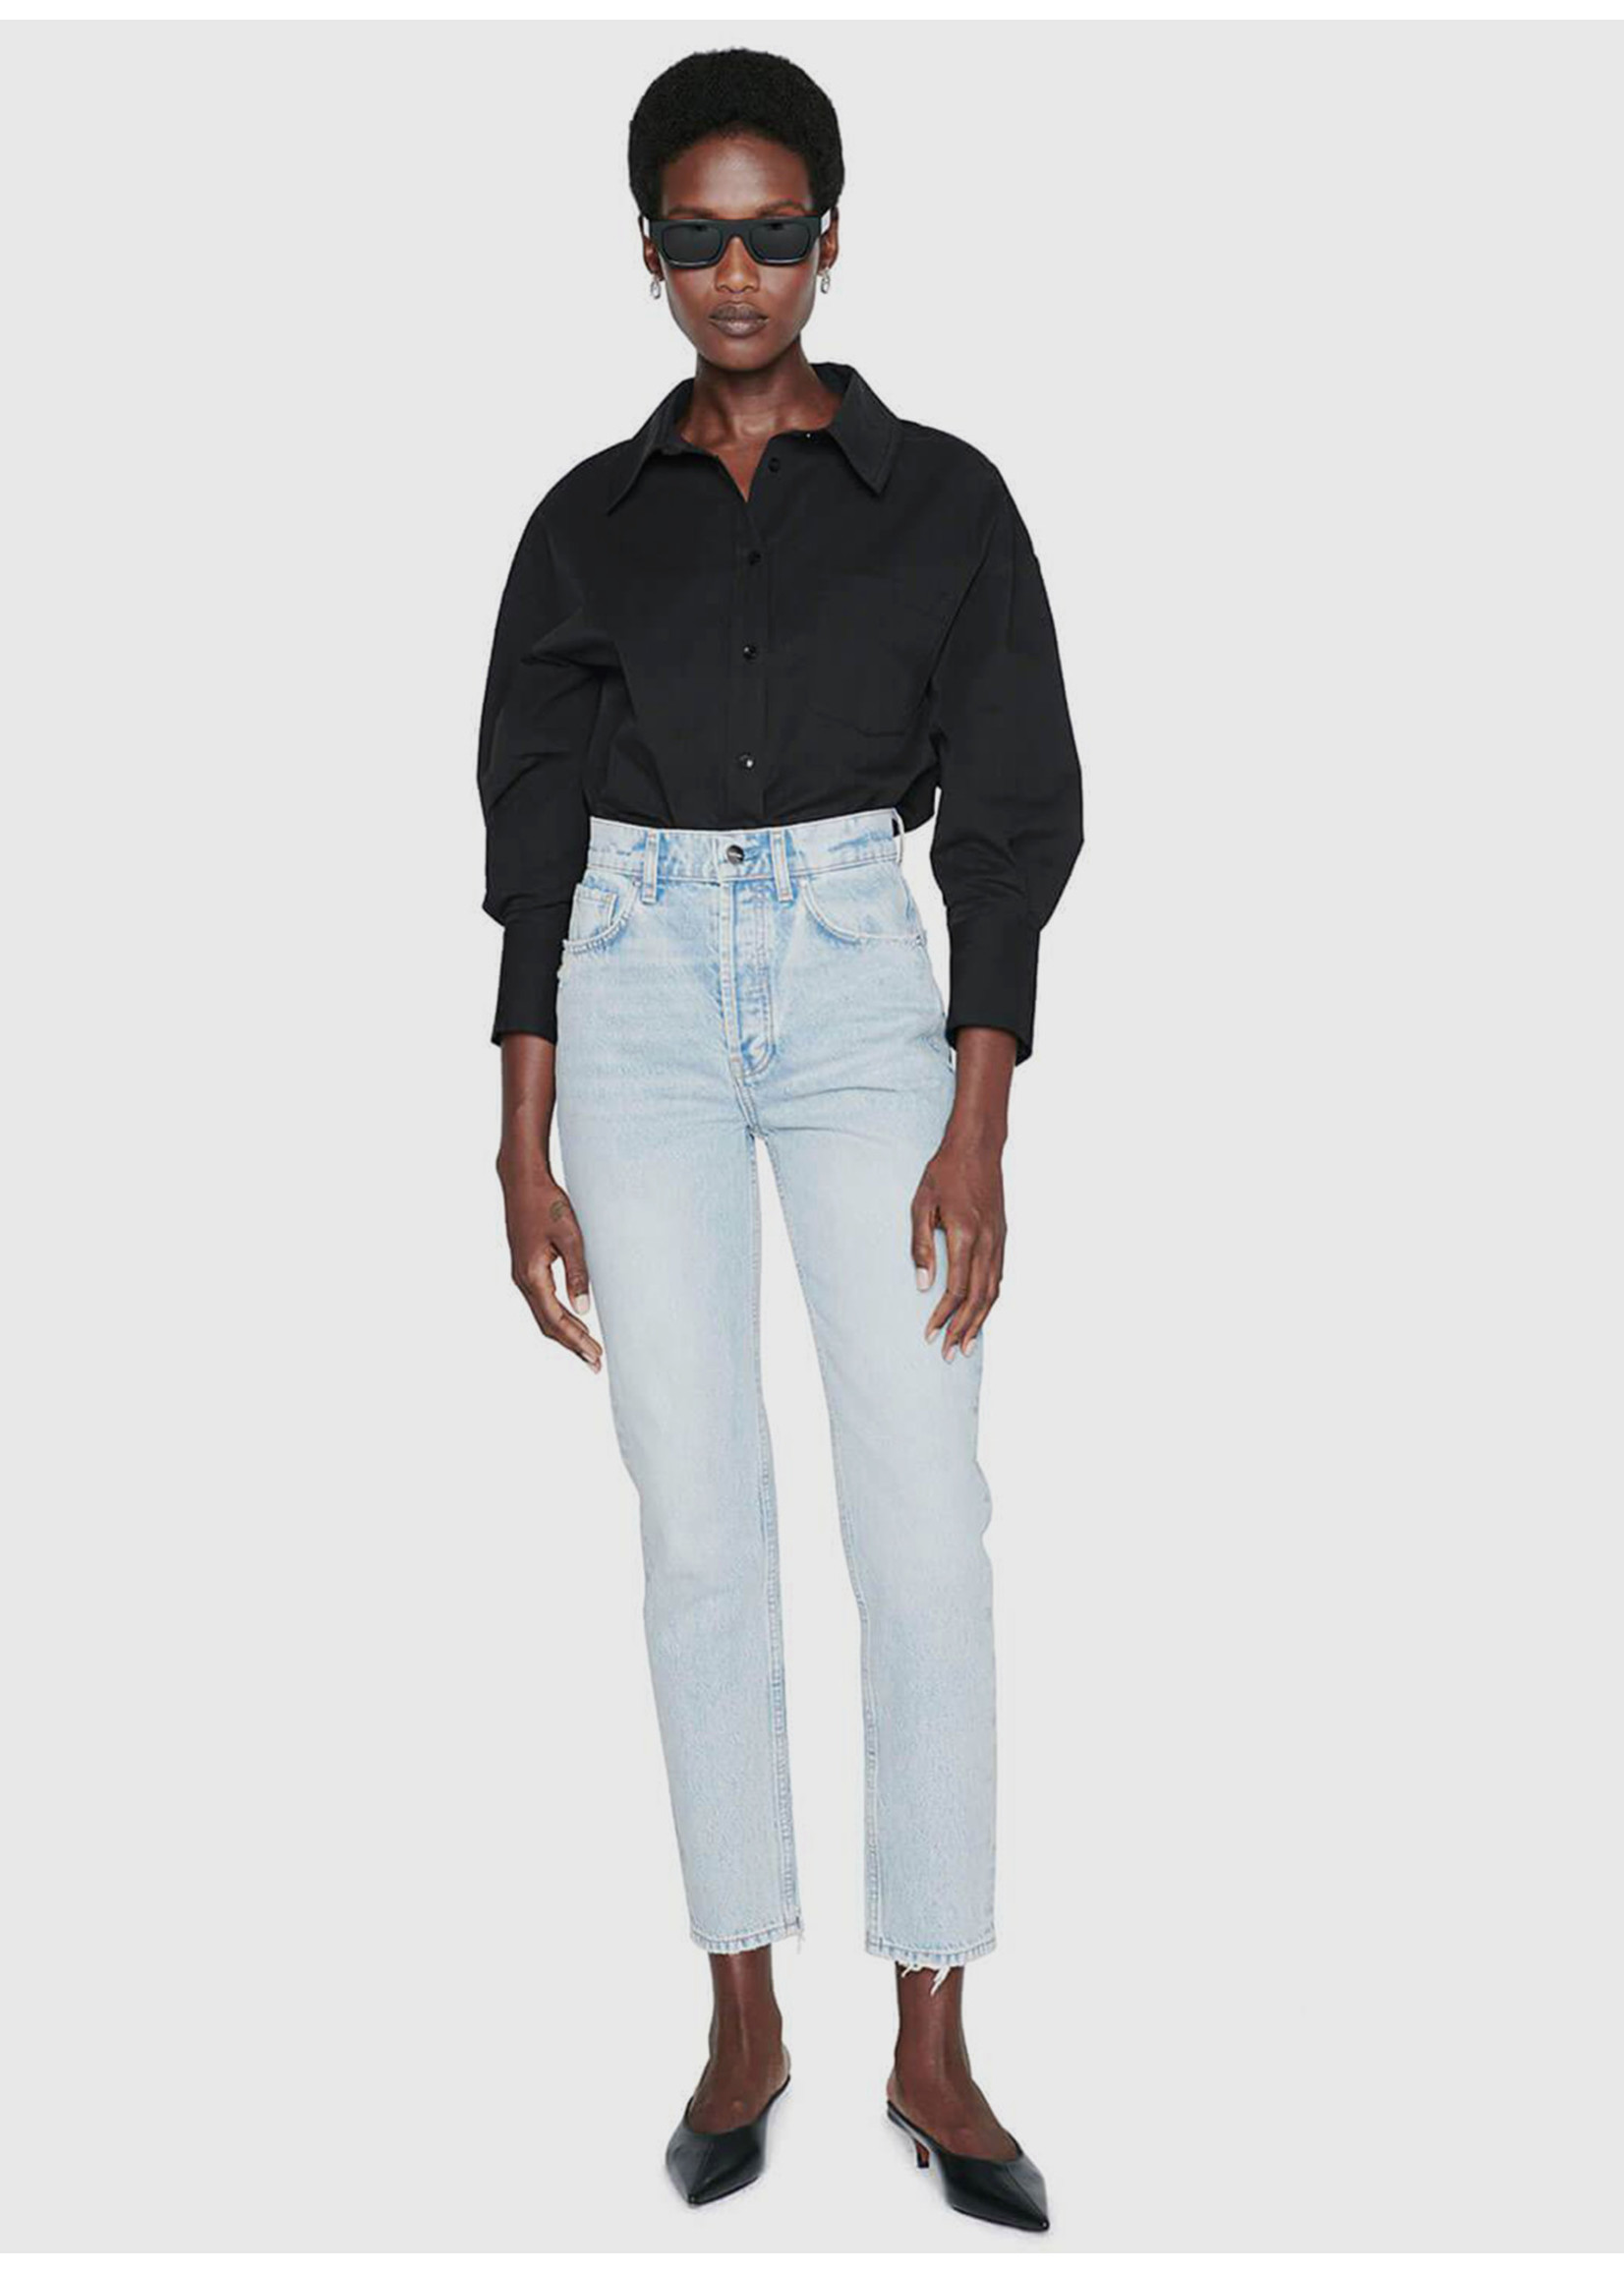 Anine Bing Mika Shirt Black